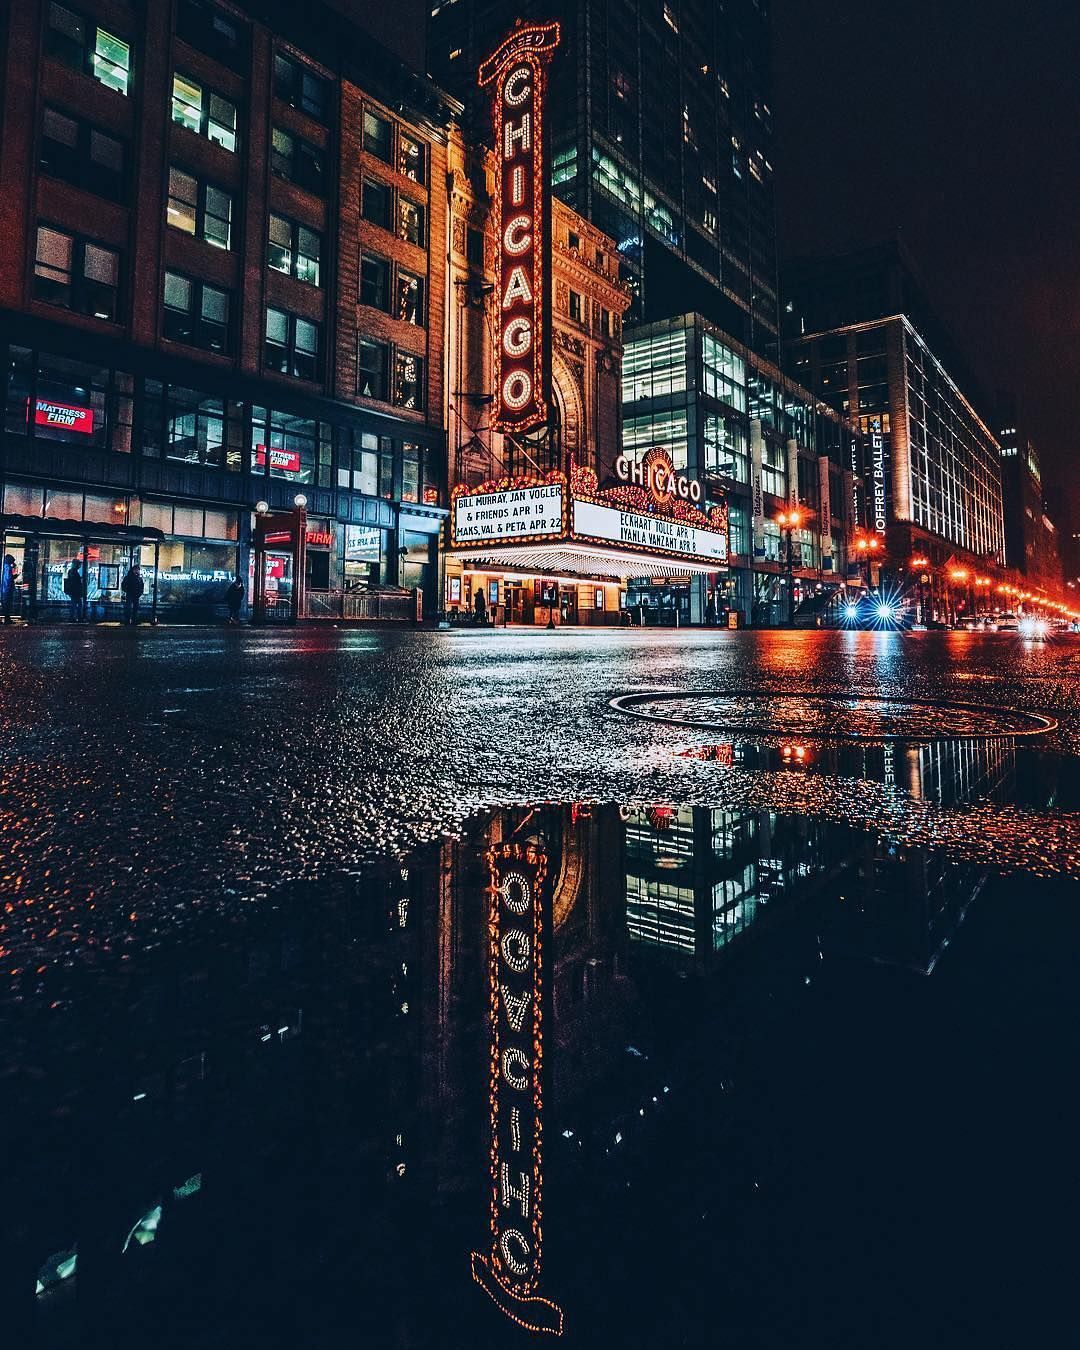 Photo B City Aesthetic Chicago Photography City Photography